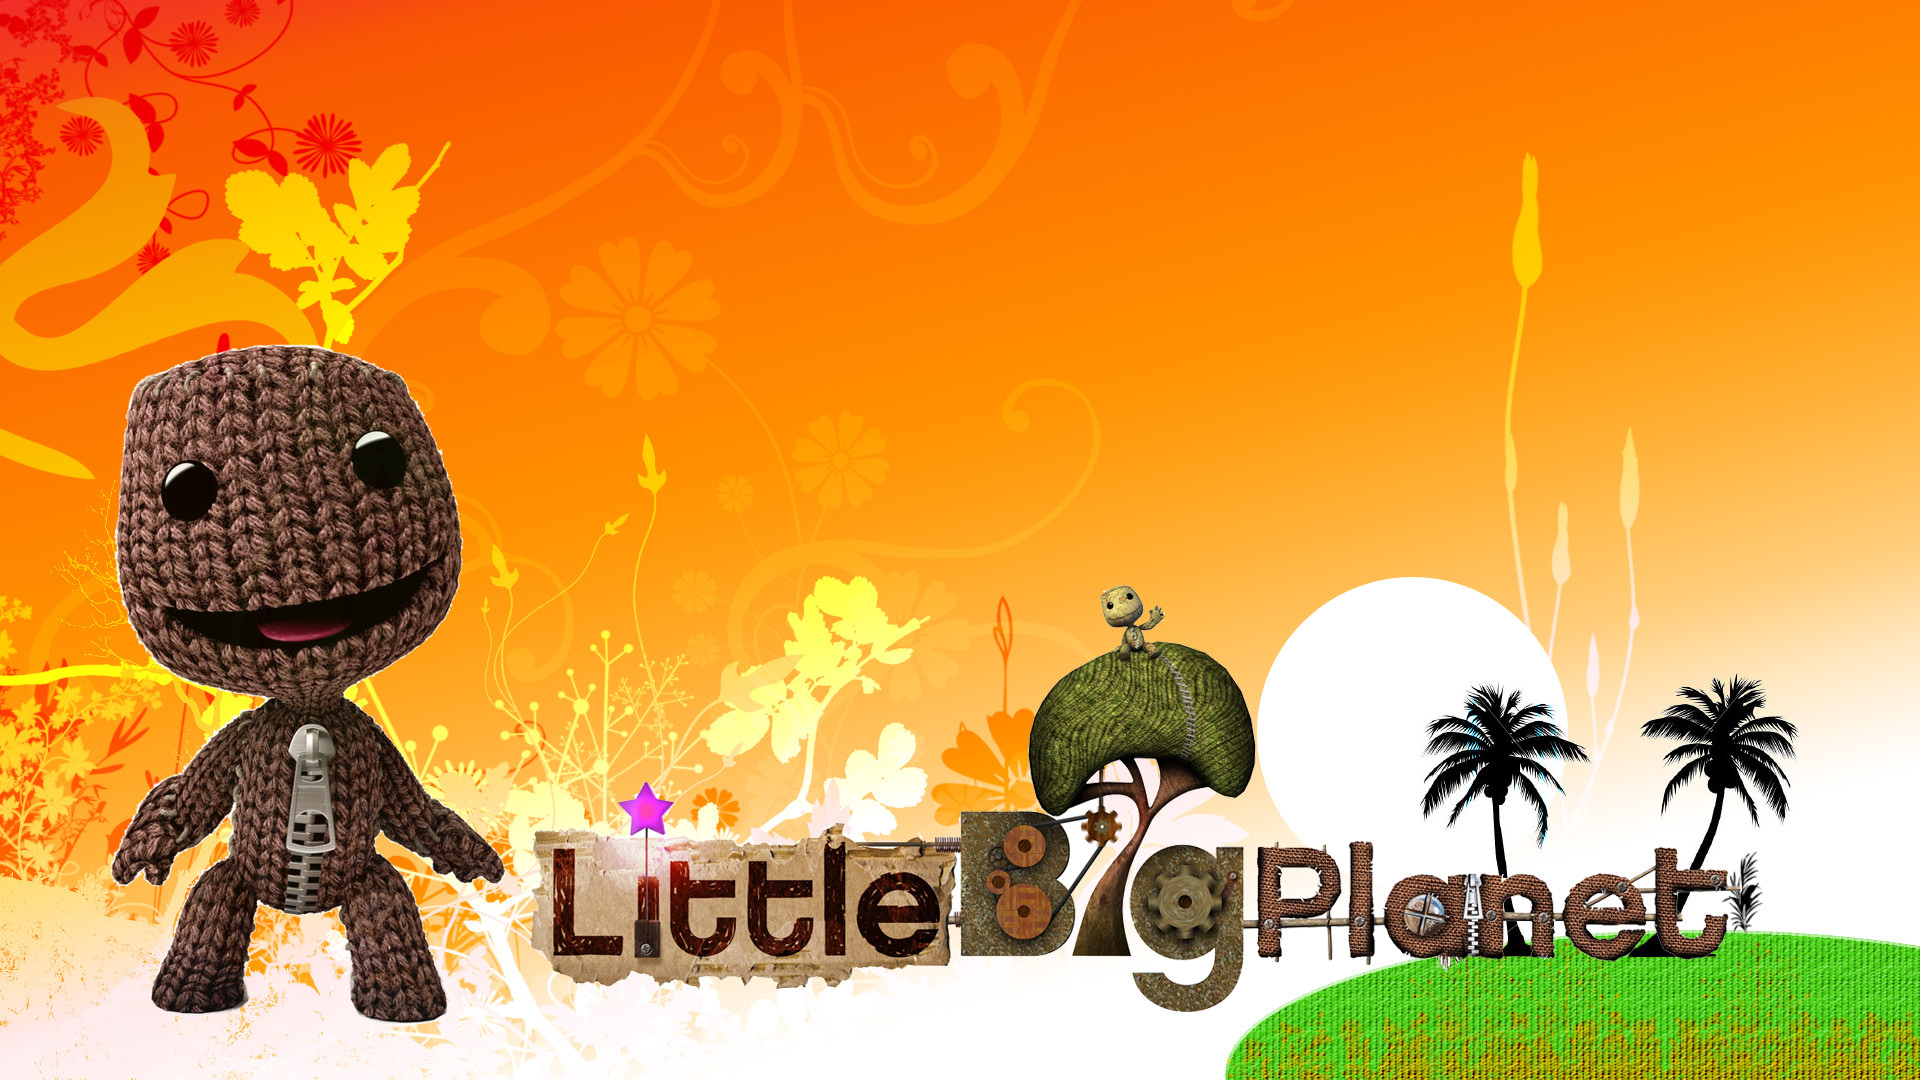 Little Big Planet Sackboy wallpaper – 280763